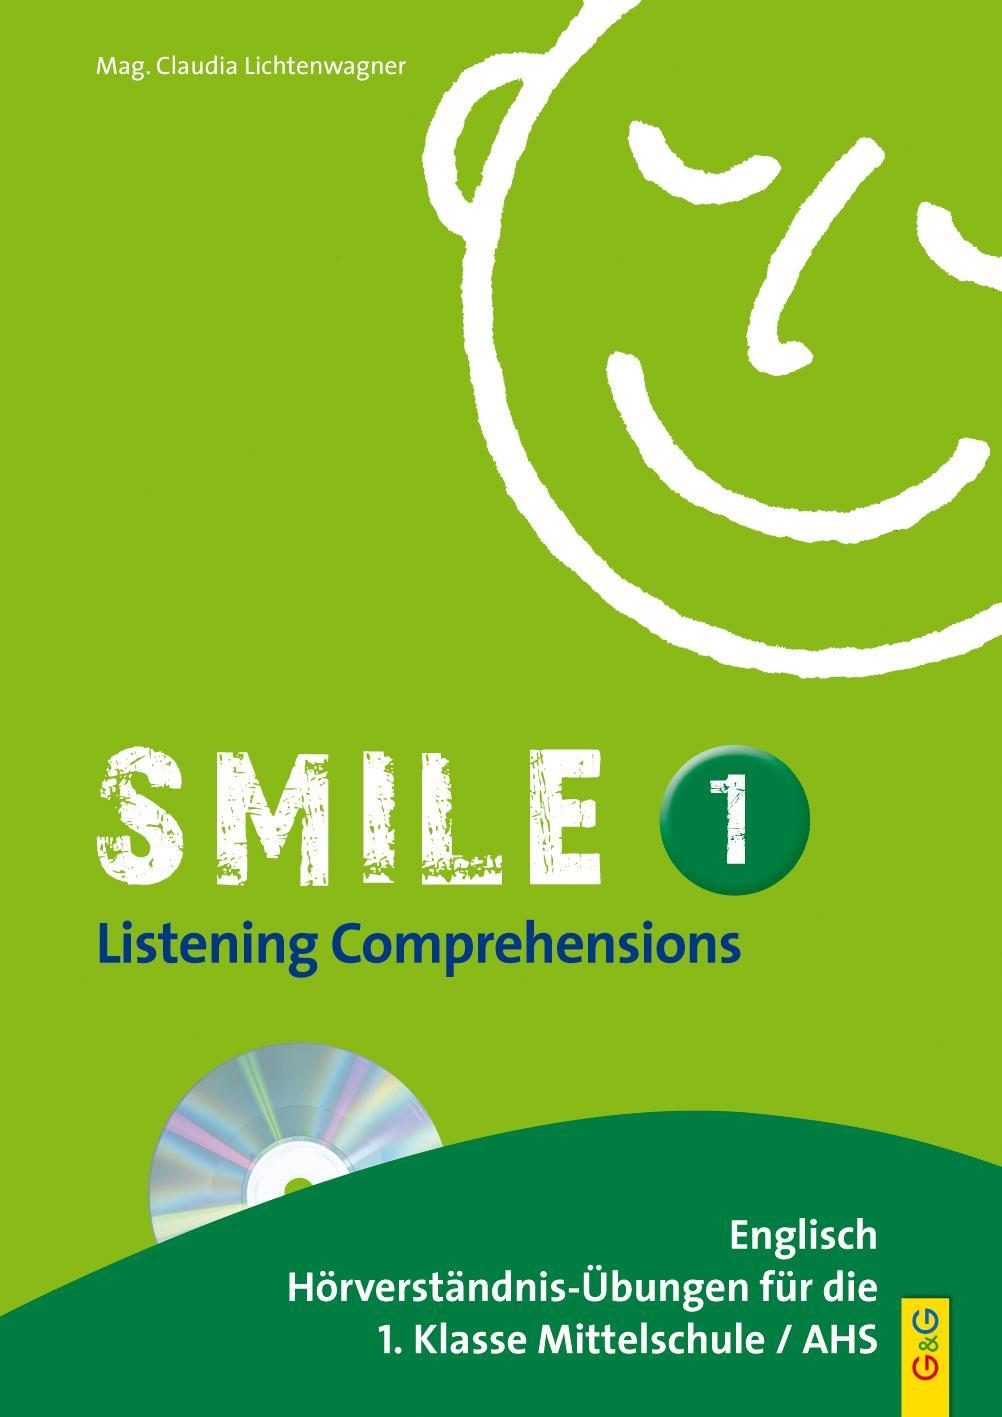 Smile - Listening Comprehension 1 mit CD, Claudia Lichtenwagner